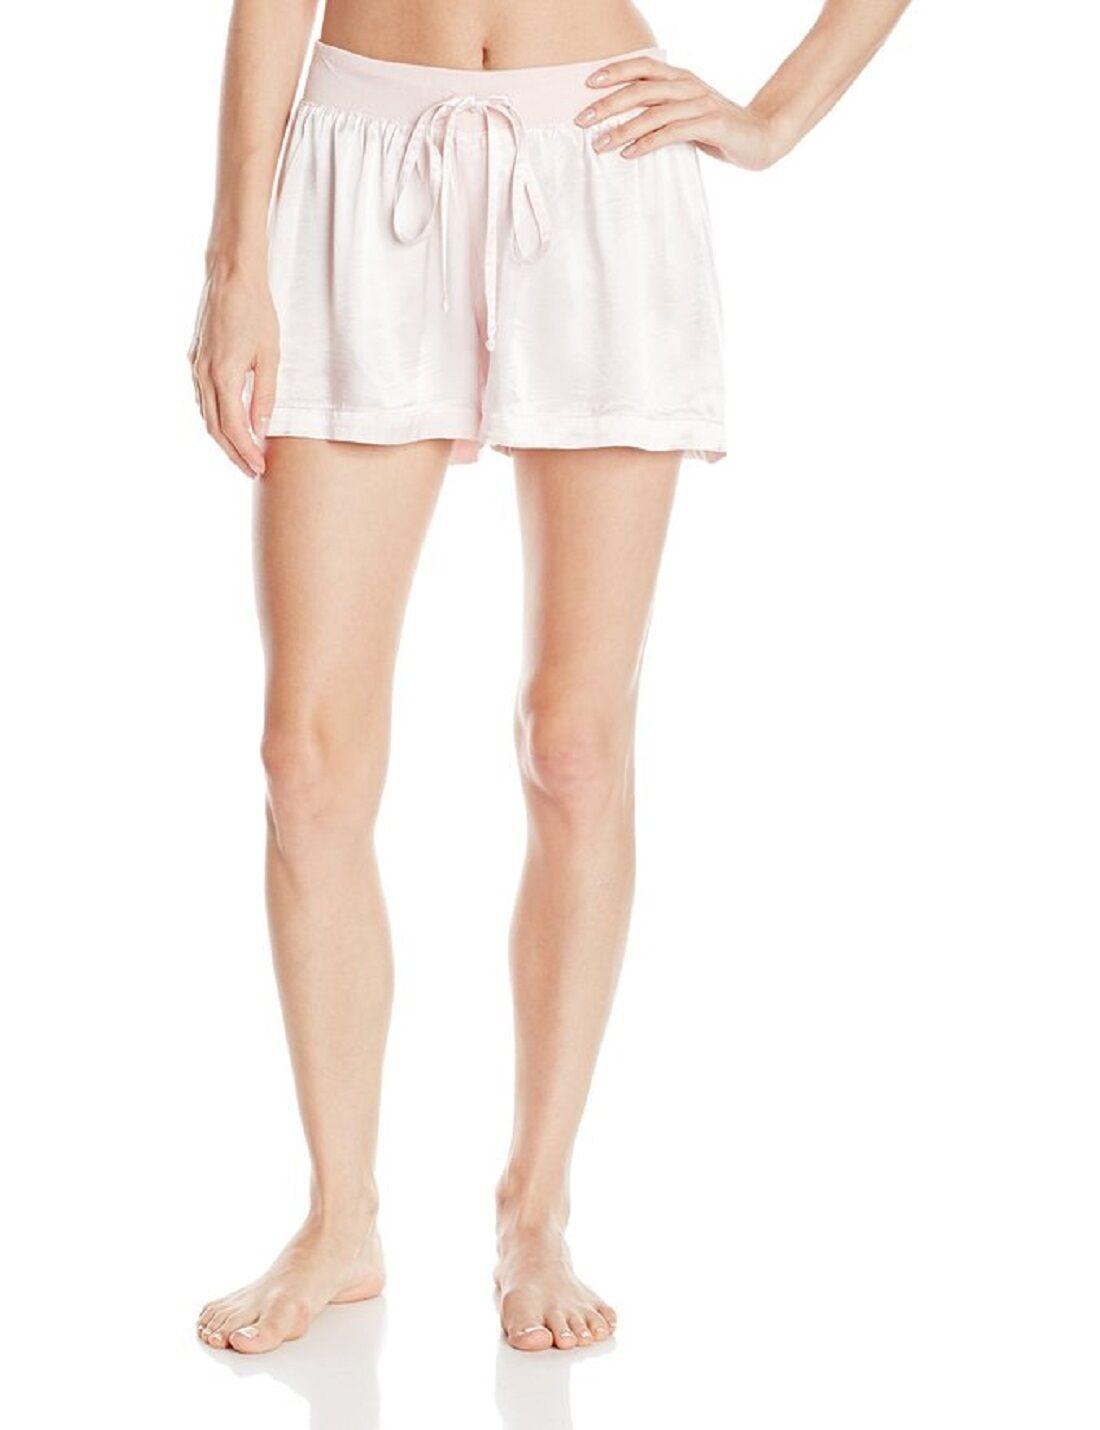 5f087eaffd PJ Harlow Women s Mikel Satin Boxer Short With Draw String - PJSB5 PJ  Harlow Sleepwear Sizing